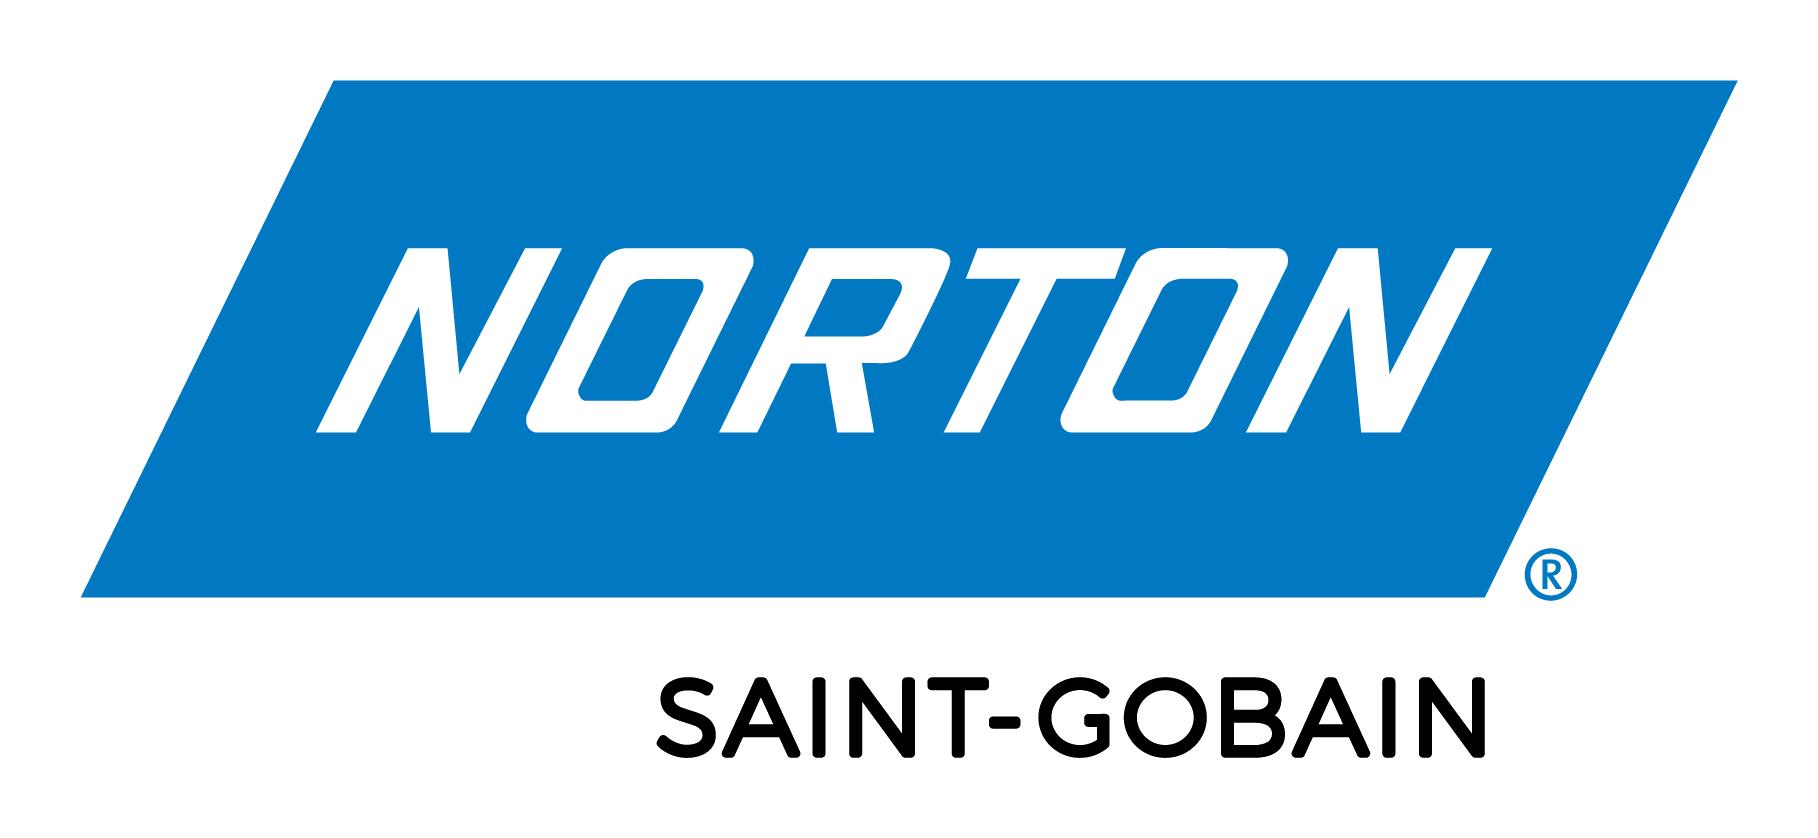 SG_Norton_logo_rgb_4